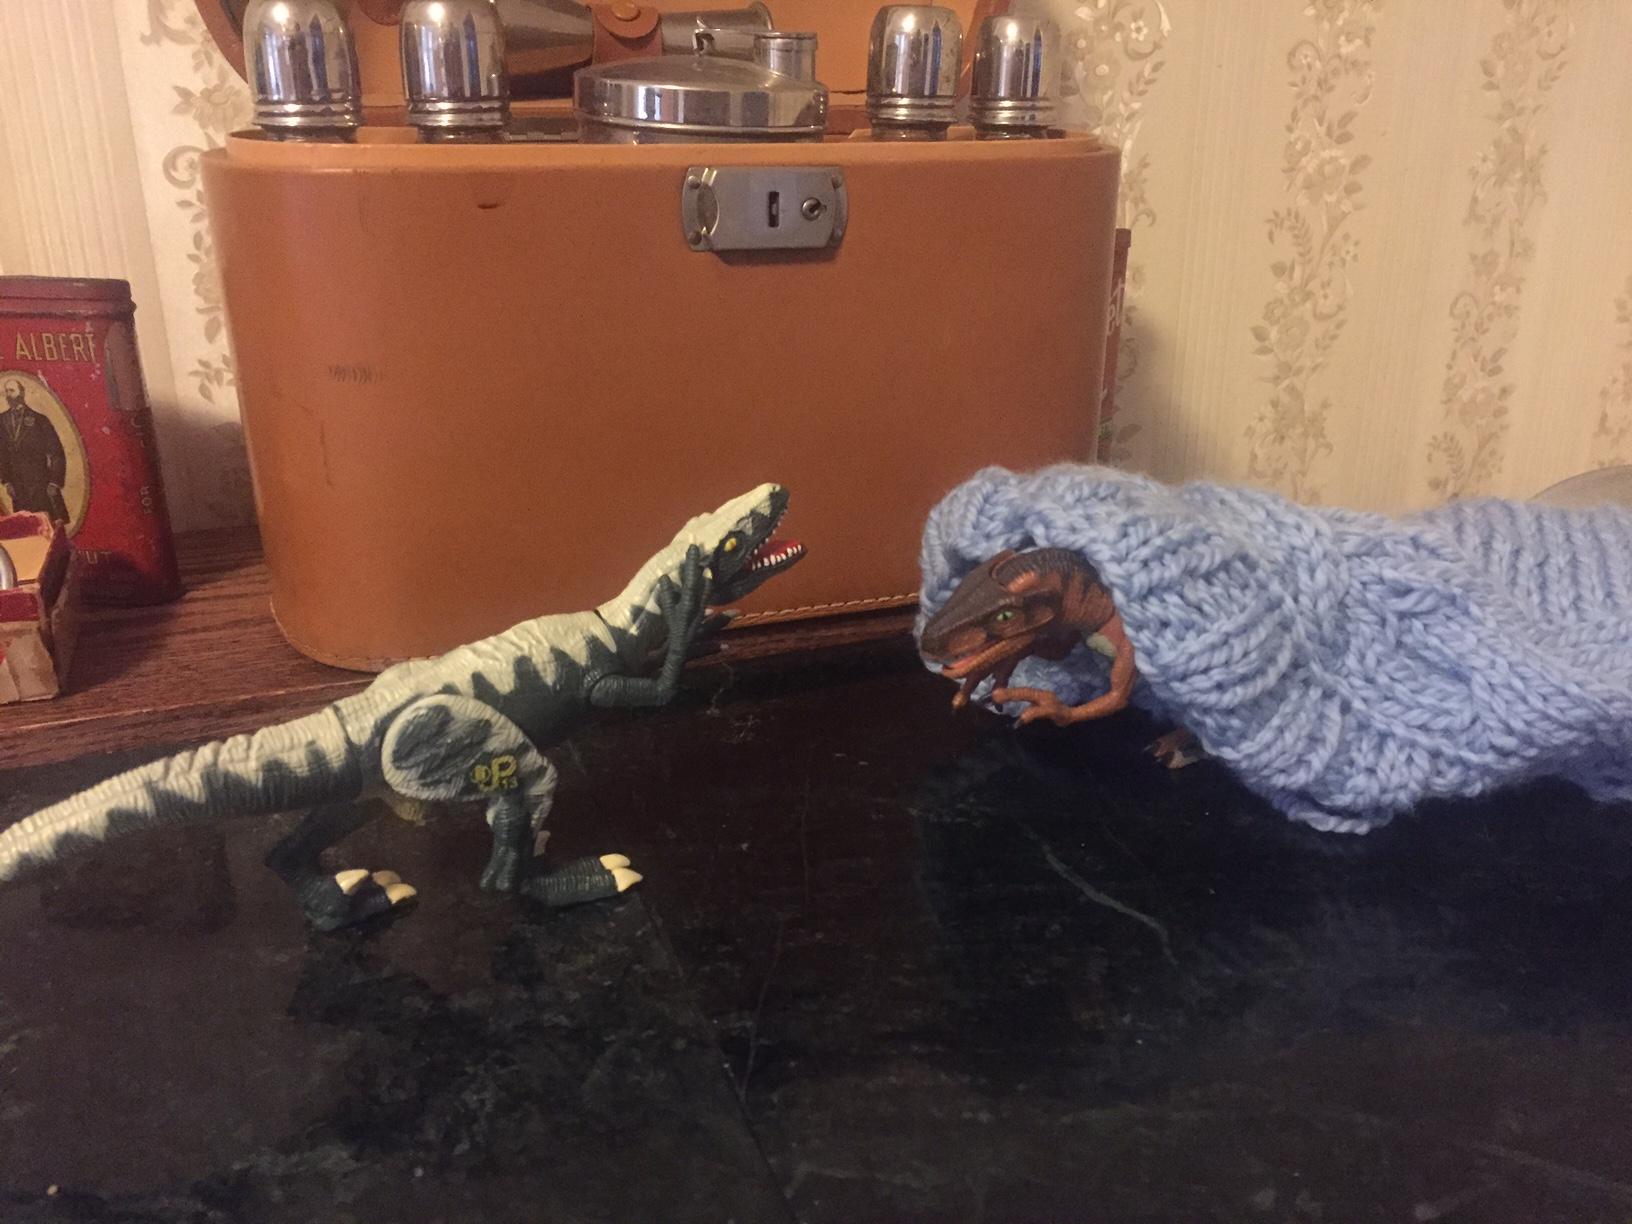 Dinosaur fashion critique.